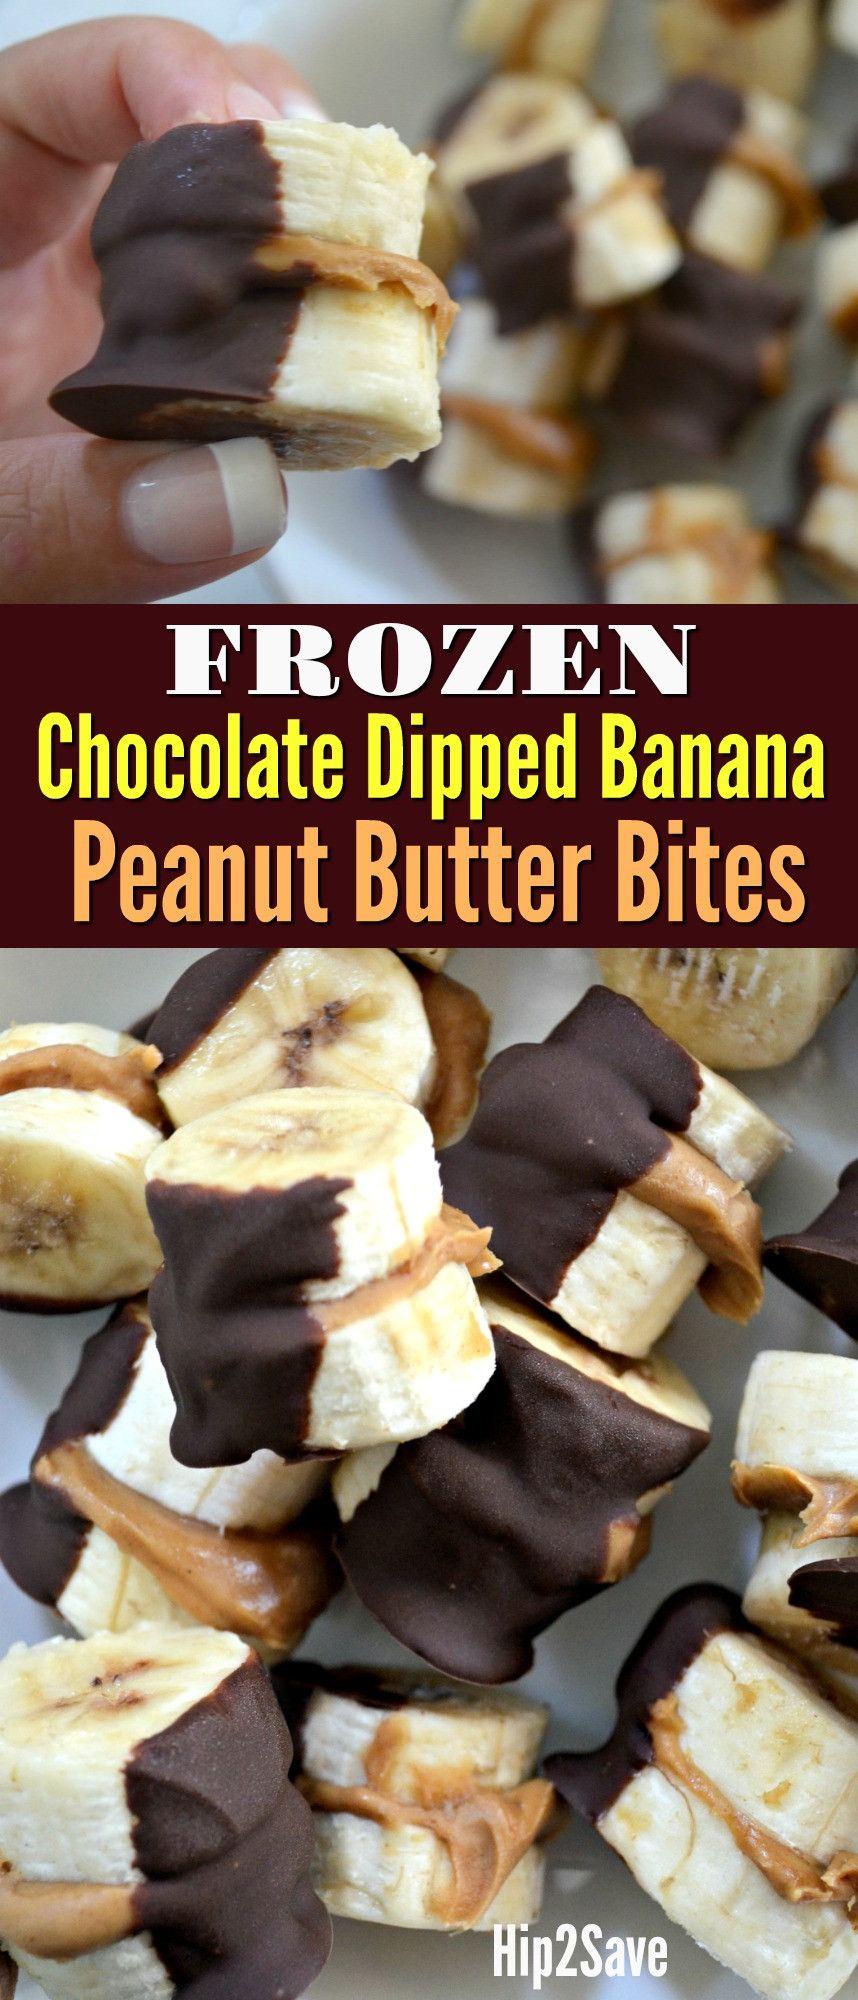 Frozen Chocolate-Dipped Peanut Butter Banana Bites